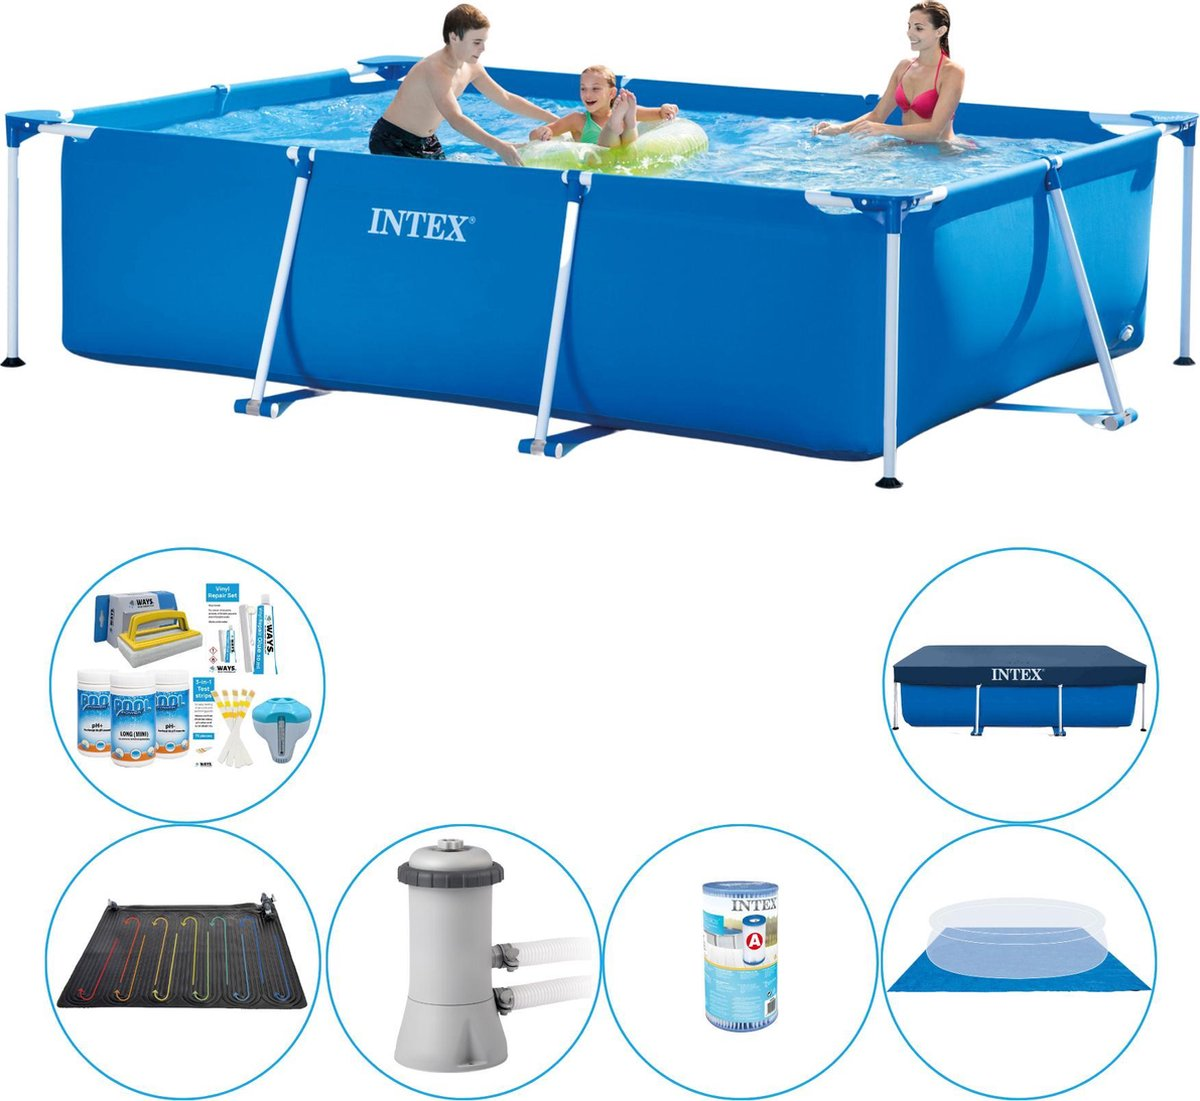 Intex Frame Pool Rechthoekig 300x200x75 cm - Zwembad Plus Accessoires